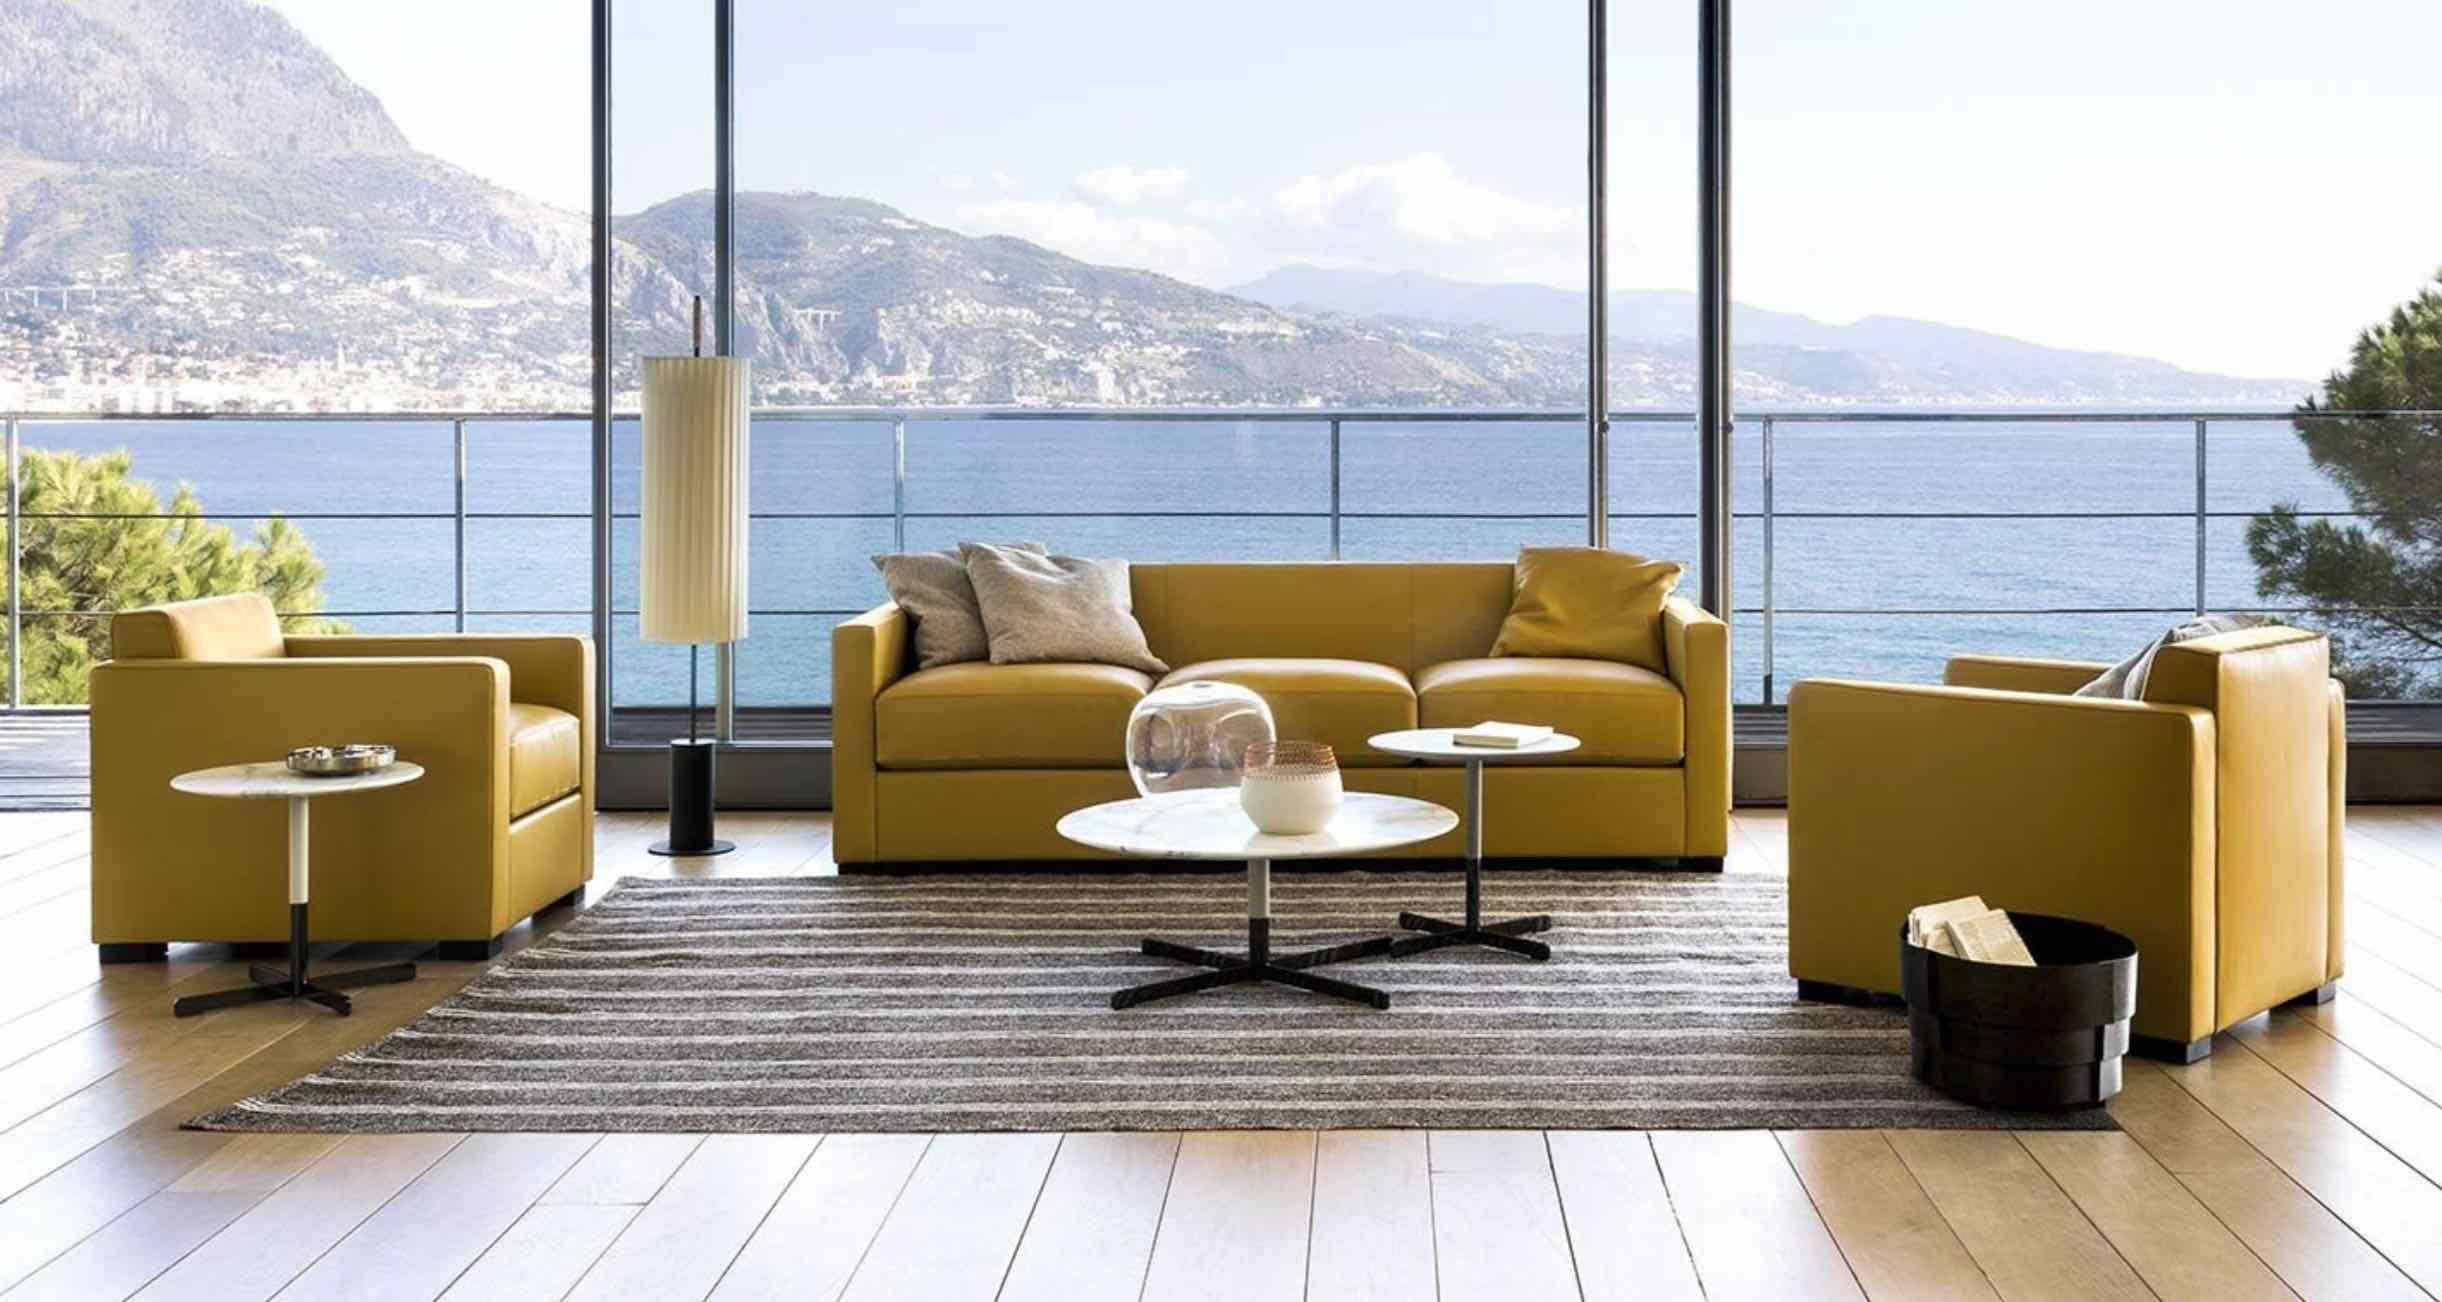 Linea A | design- Peter Marino | Poltrona Frau